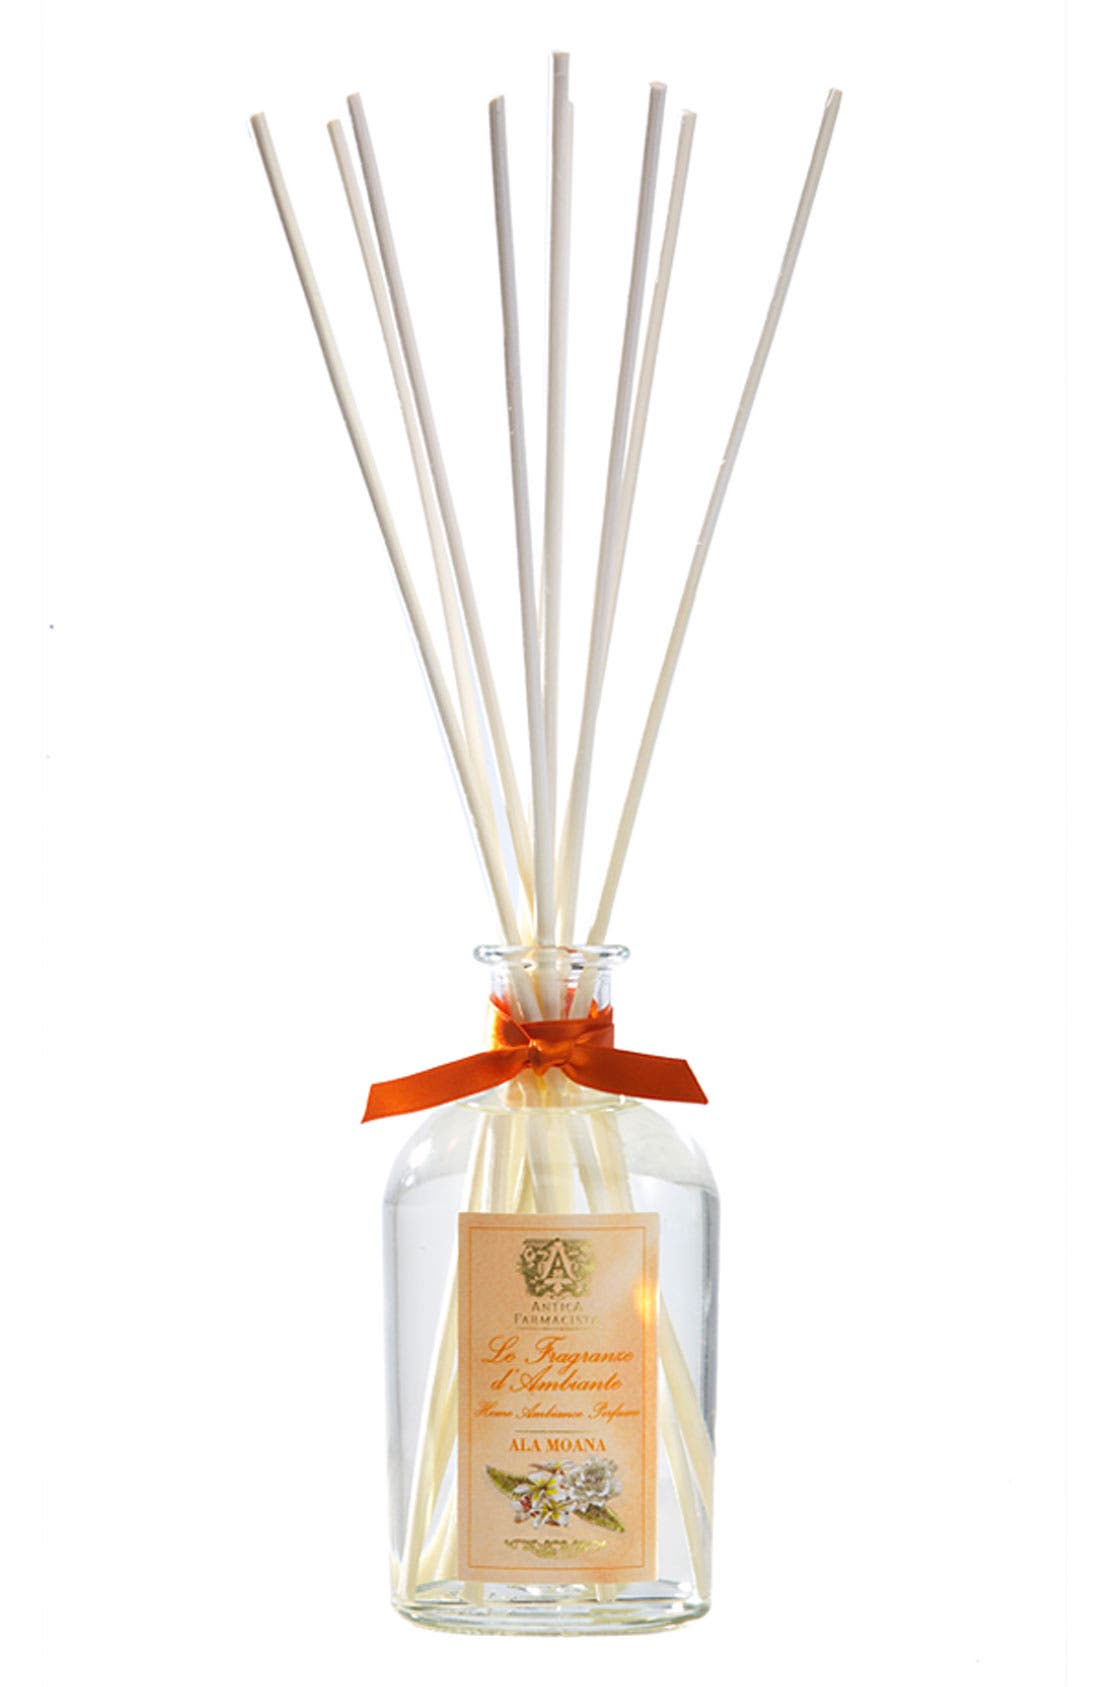 Antica Farmacista 'Ala Moana' Home Ambiance Perfume